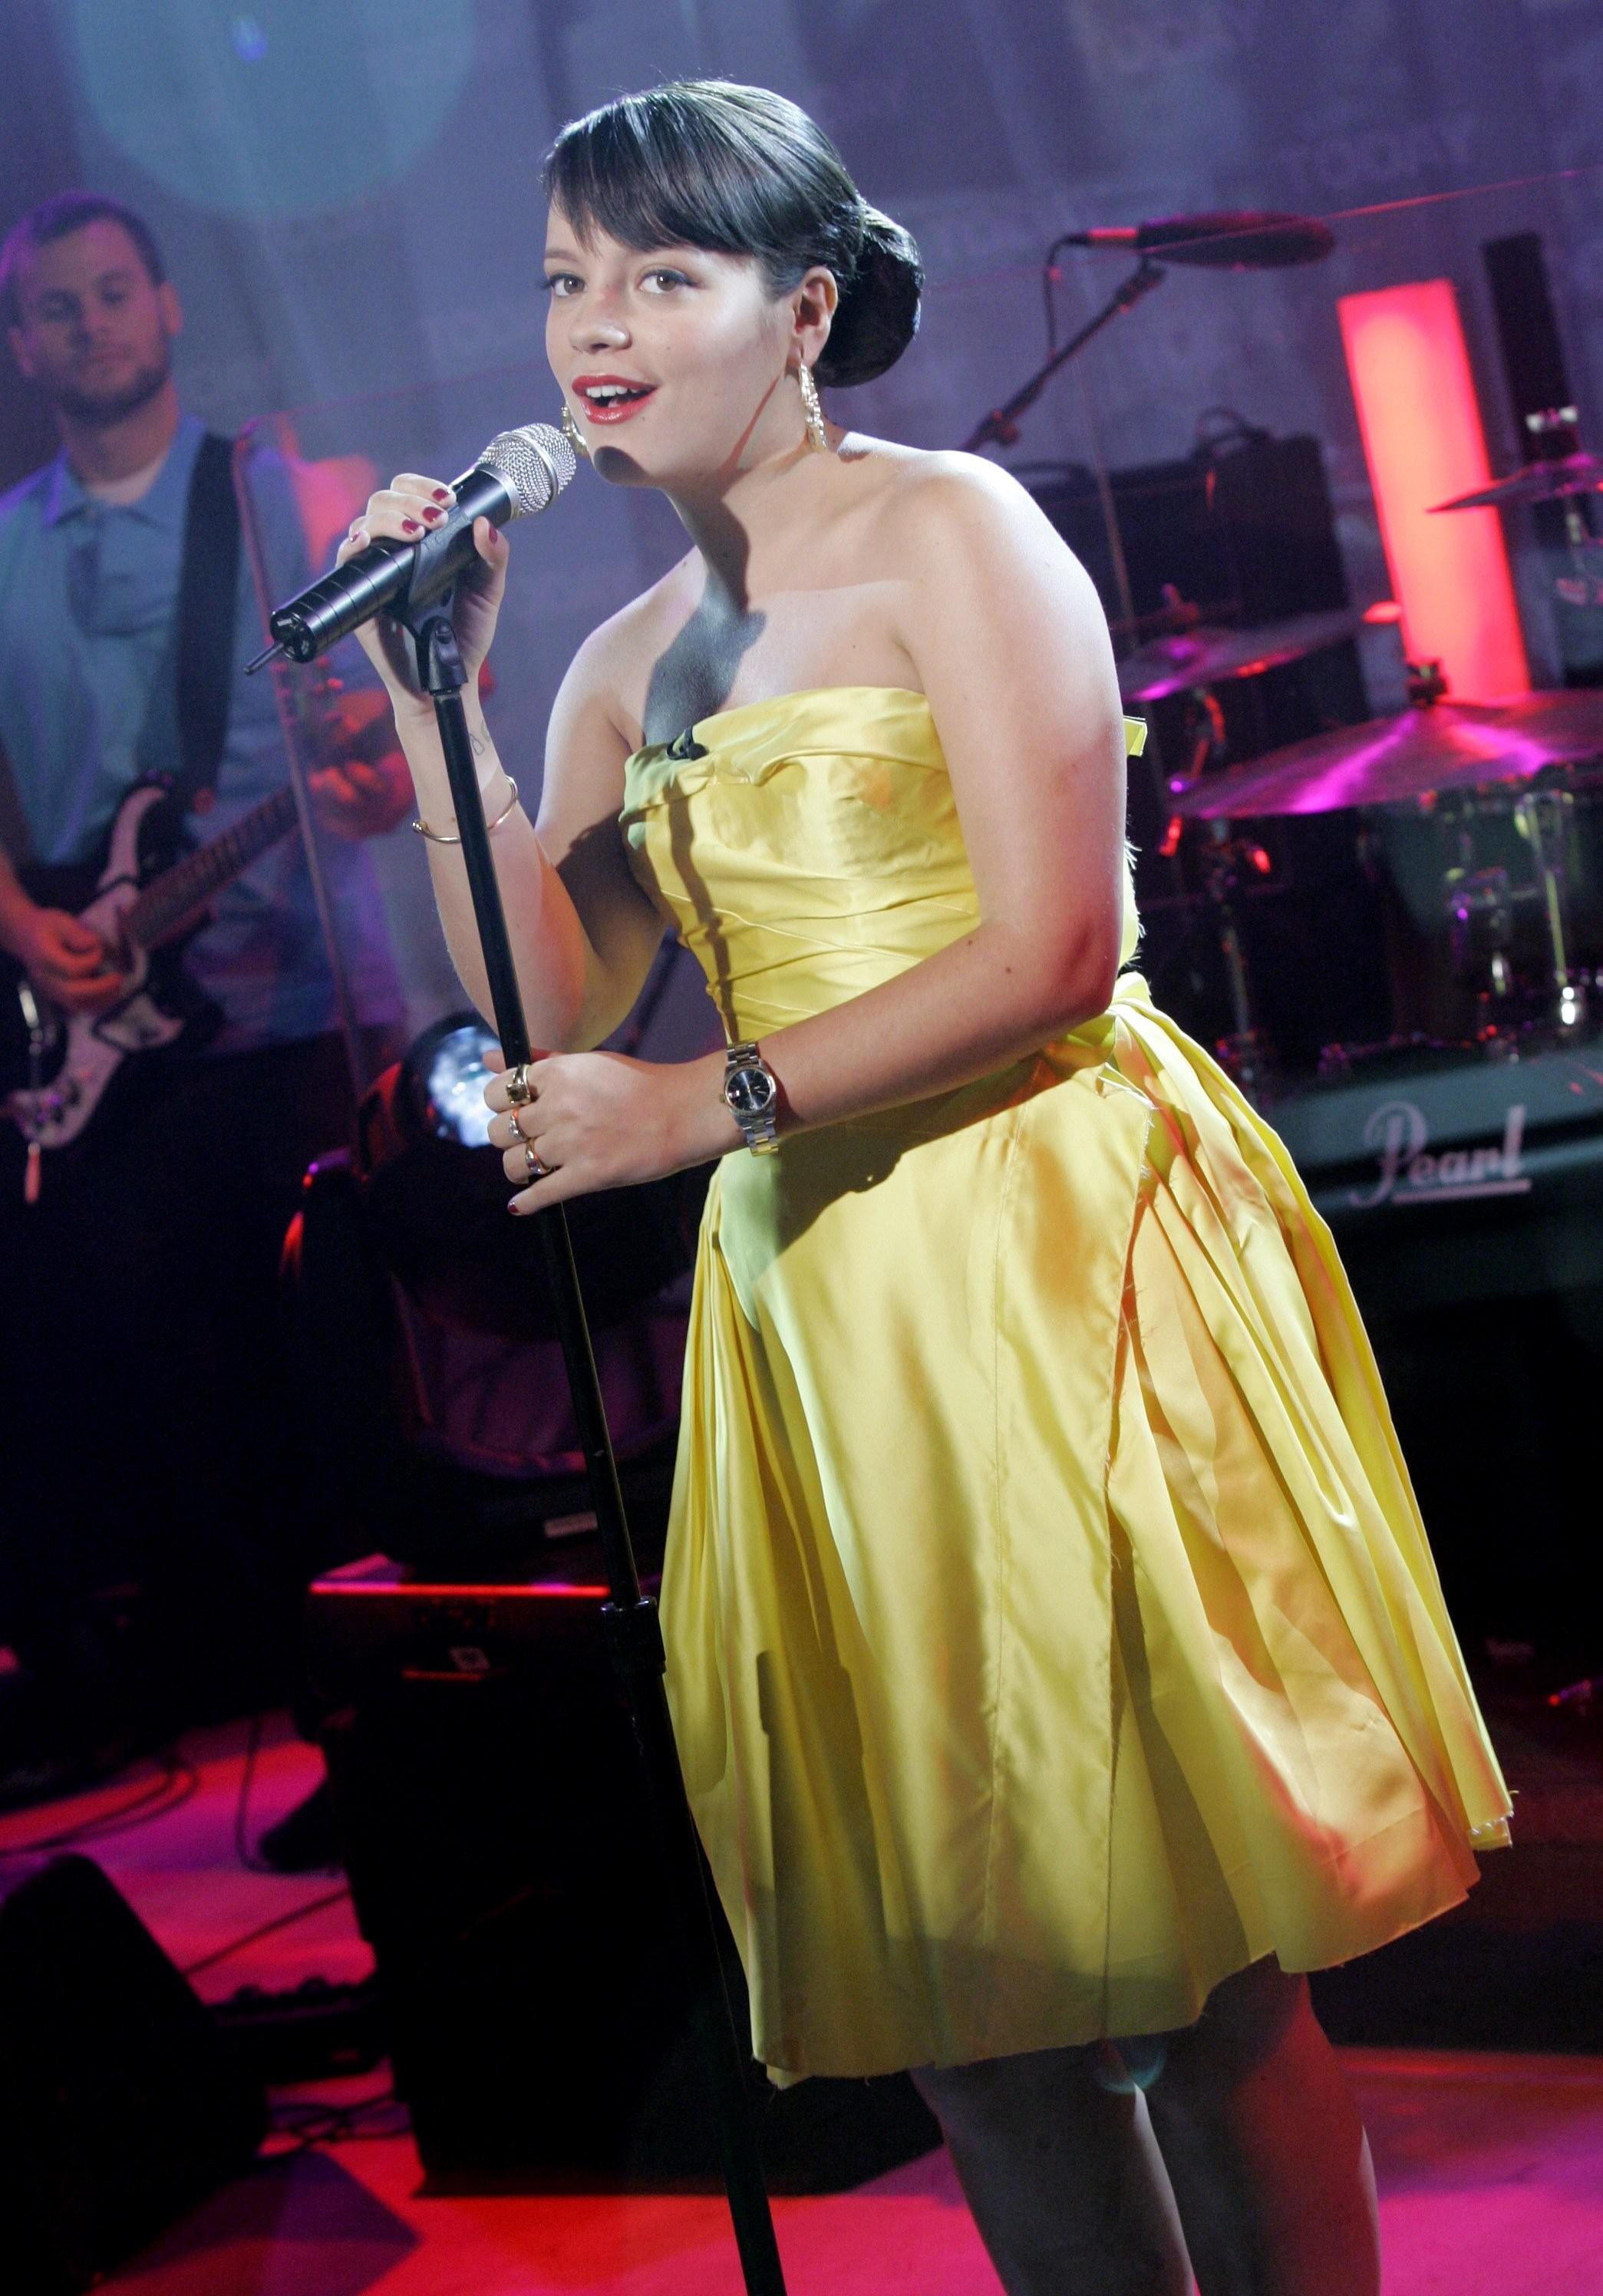 Lily Allen tour rider yellow dress